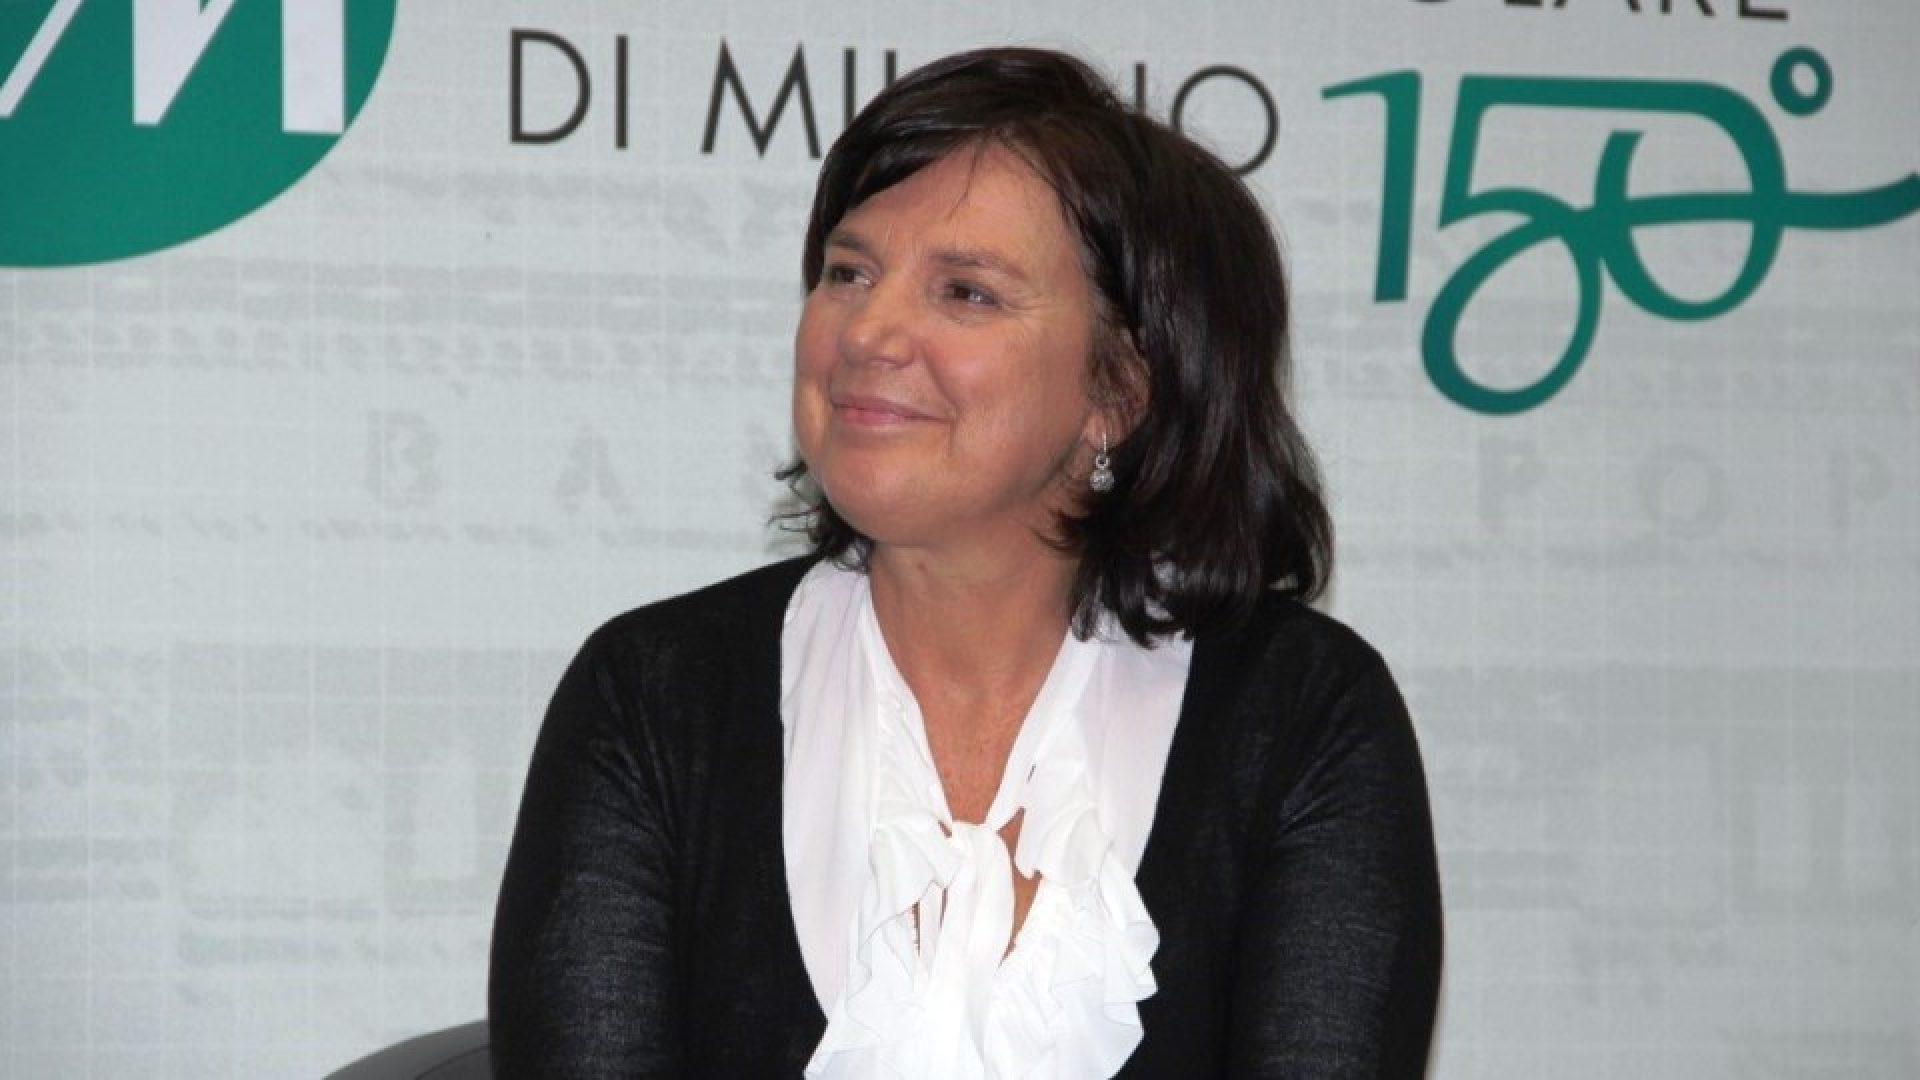 ALESSANDRA MARZARI